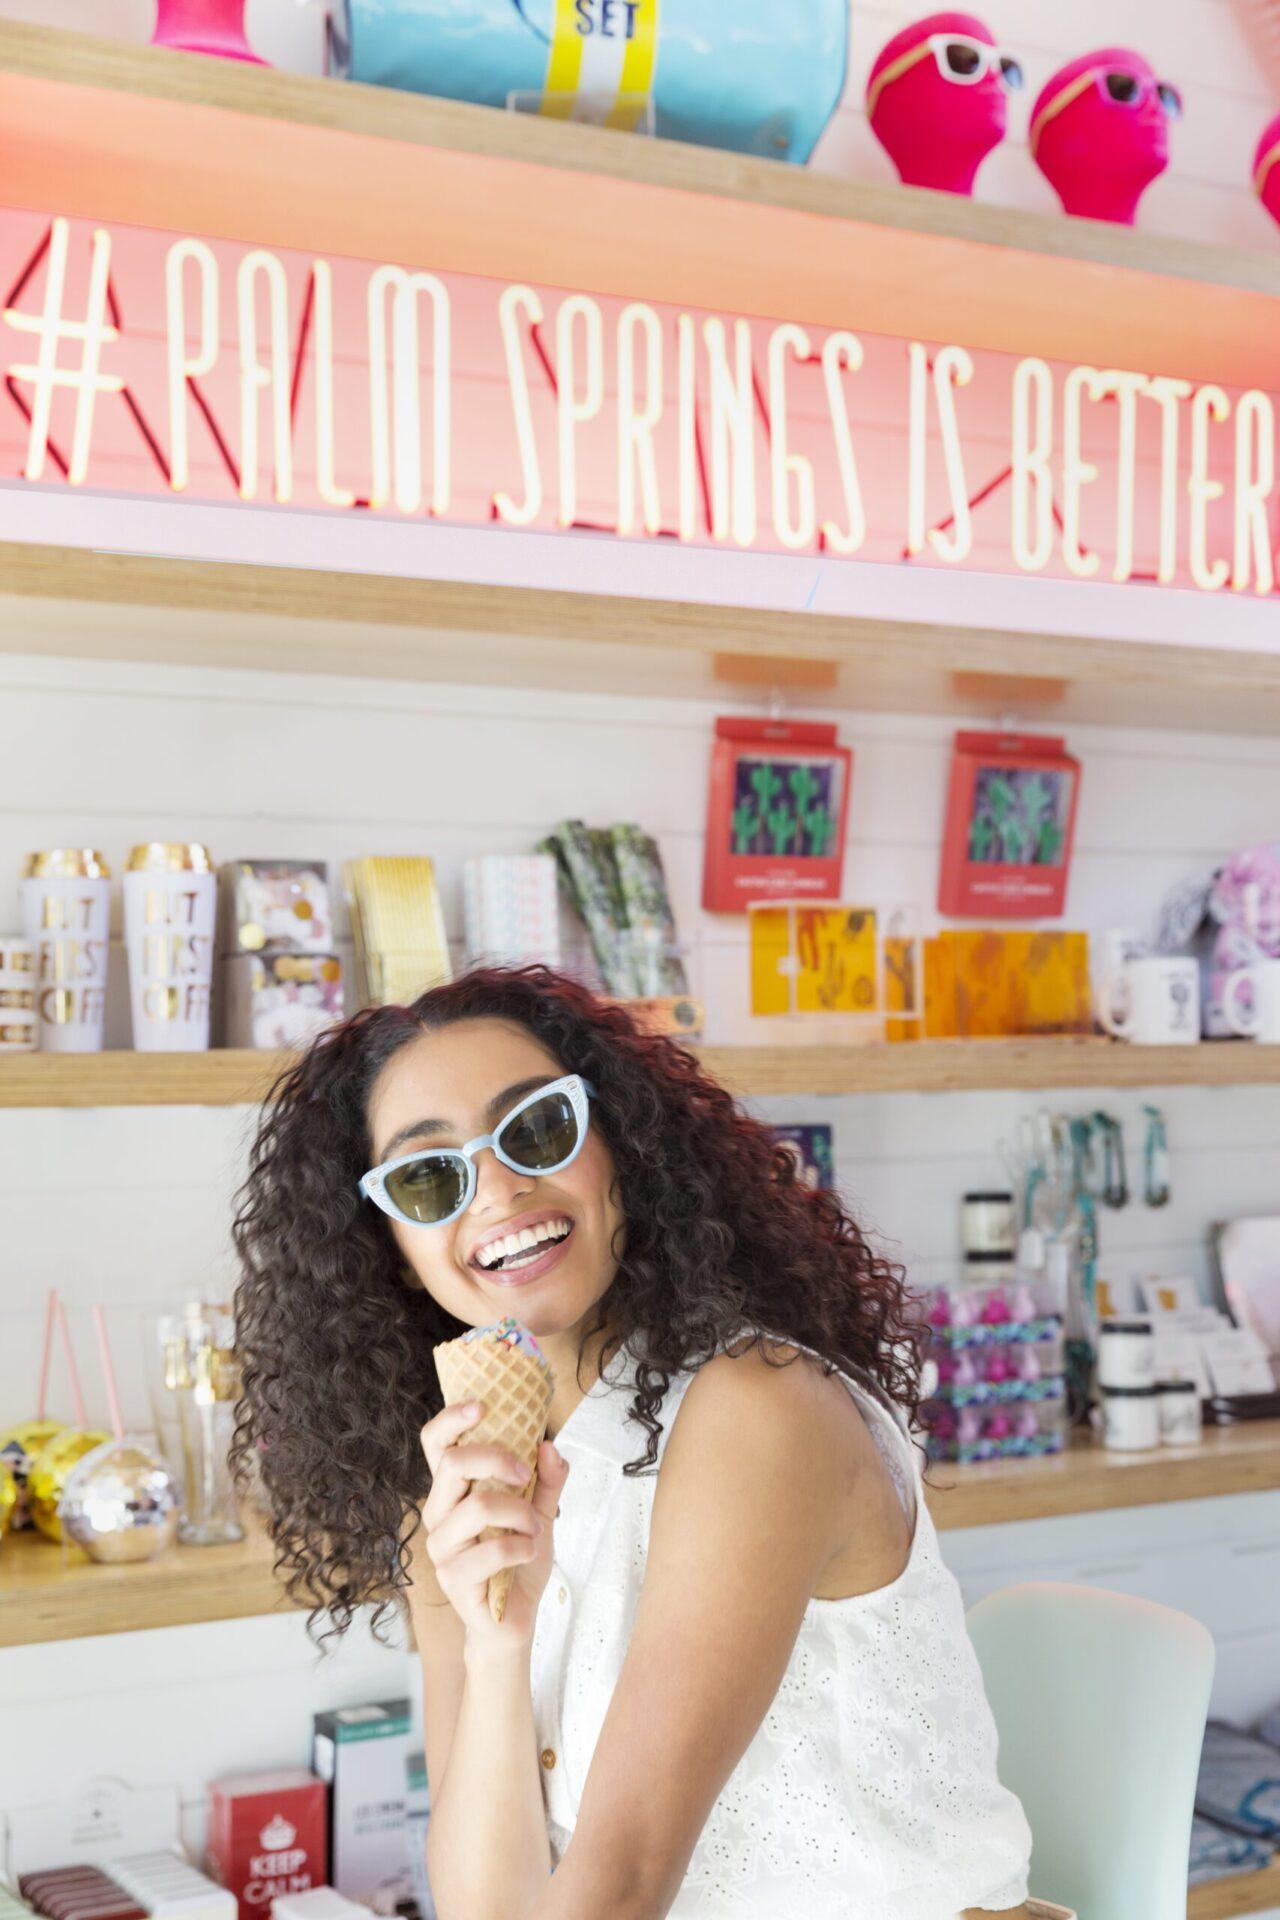 arrive ice cream shoppe